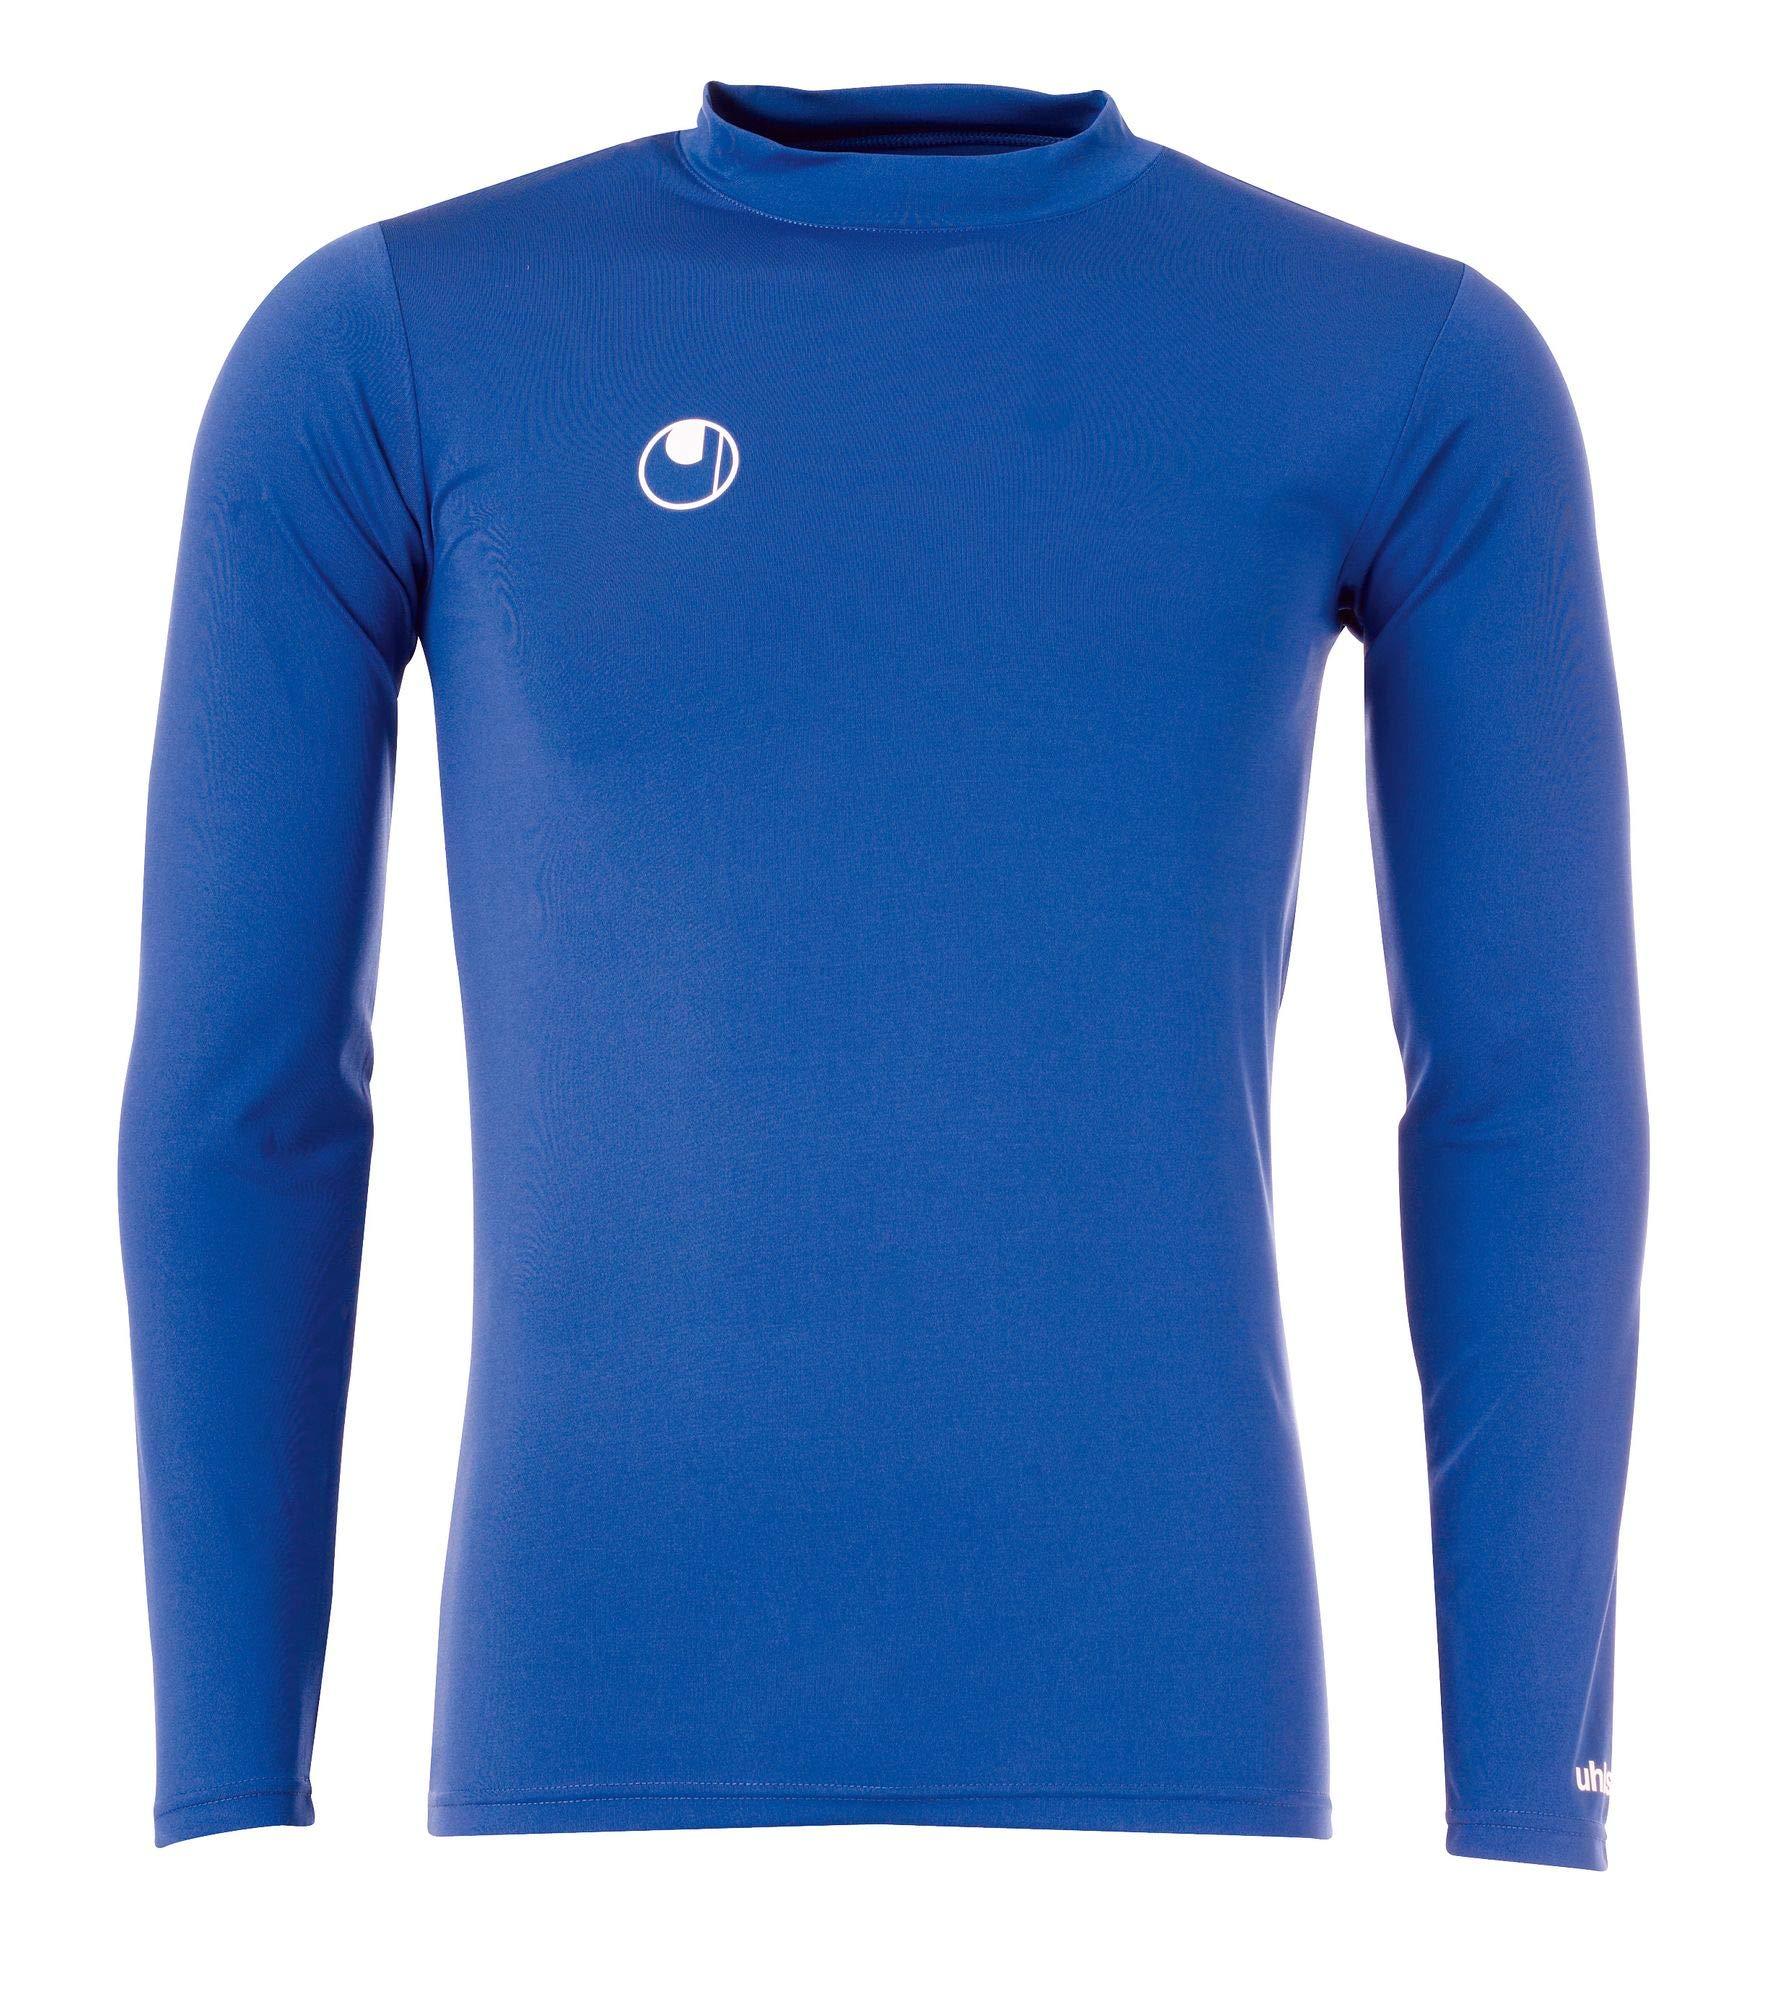 uhlsport T-Shirt Funktionsshirt LA Herren, azurblau, L